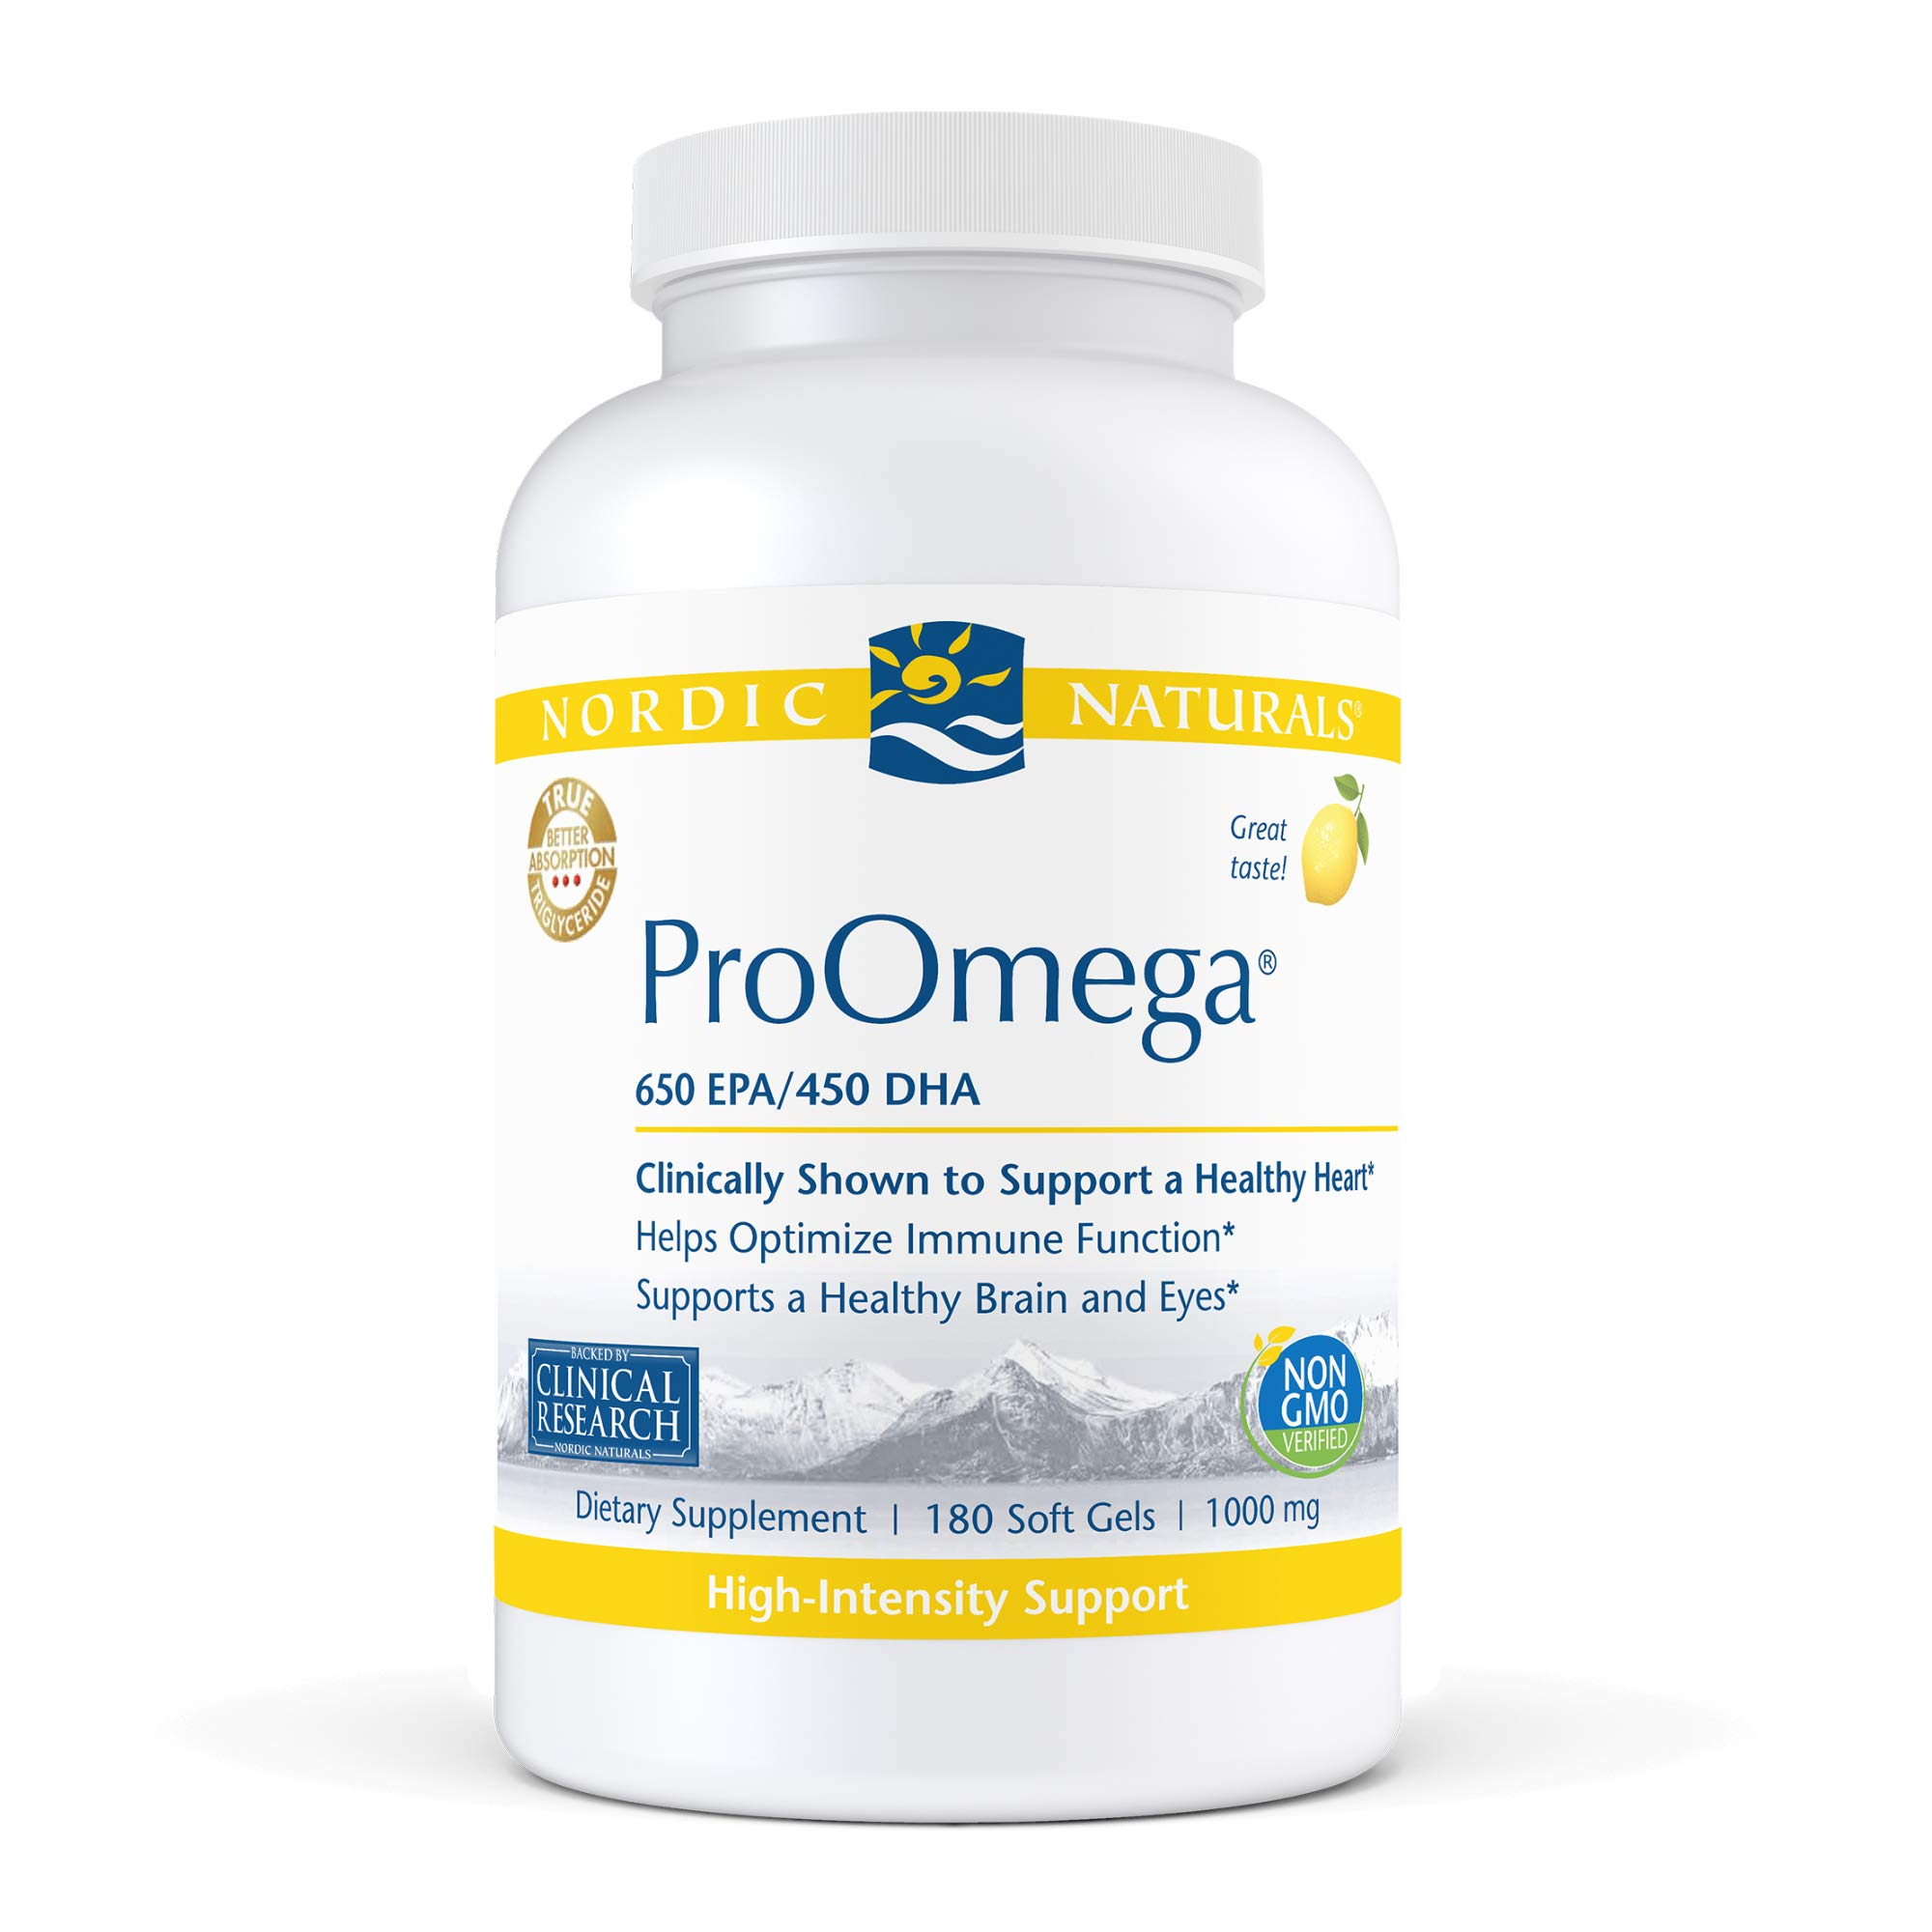 Nordic Naturals ProOmega, Lemon Flavor - 1280 mg Omega-3 - 180 Soft Gels - High-Potency Fish Oil with EPA & DHA - Promotes Brain, Eye, Heart, & Immune Health - Non-GMO - 90 Servings